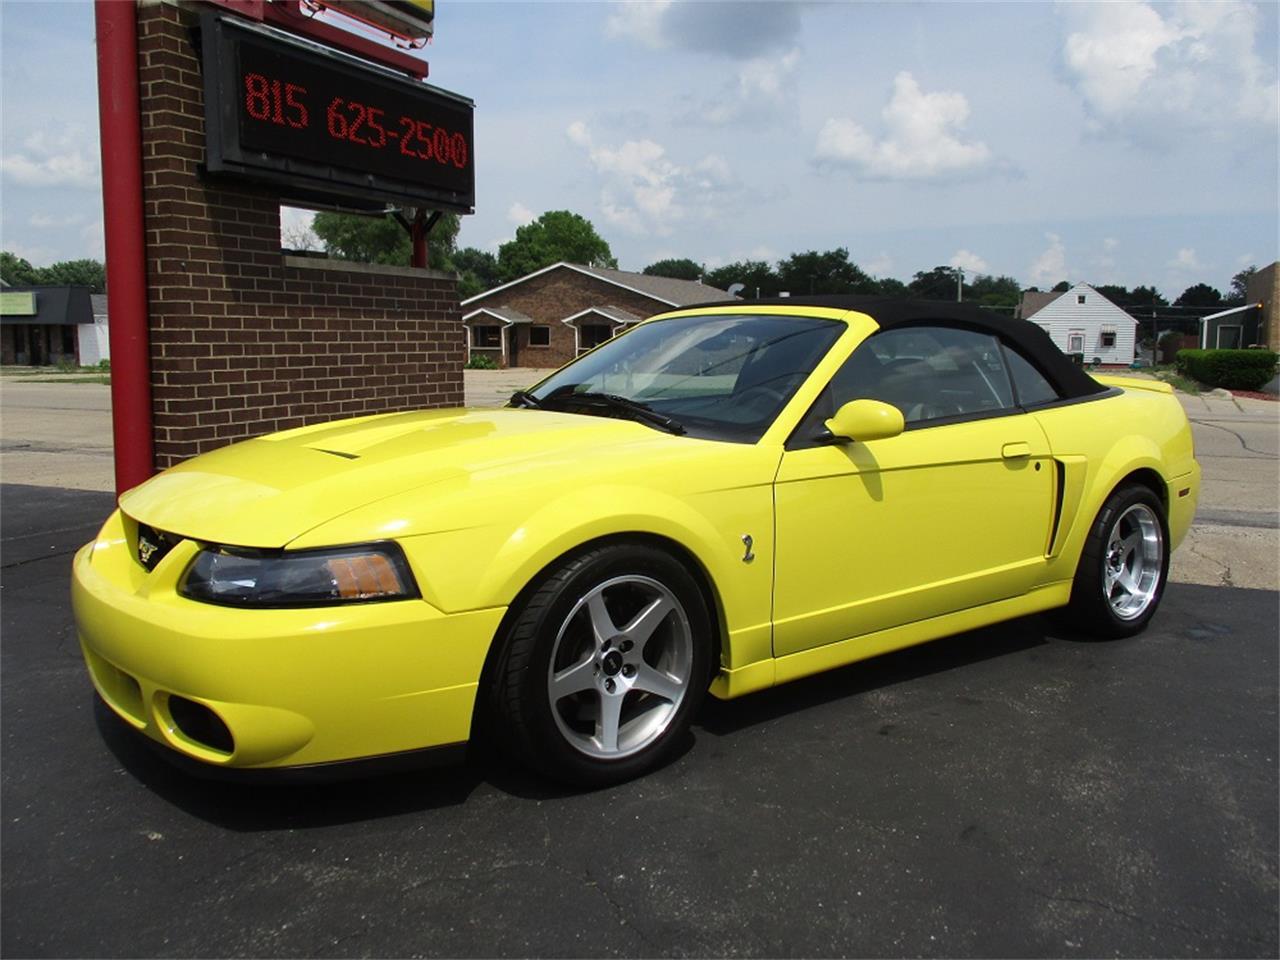 2003 Ford Mustang SVT Cobra for Sale   ClassicCars.com   CC-1104113